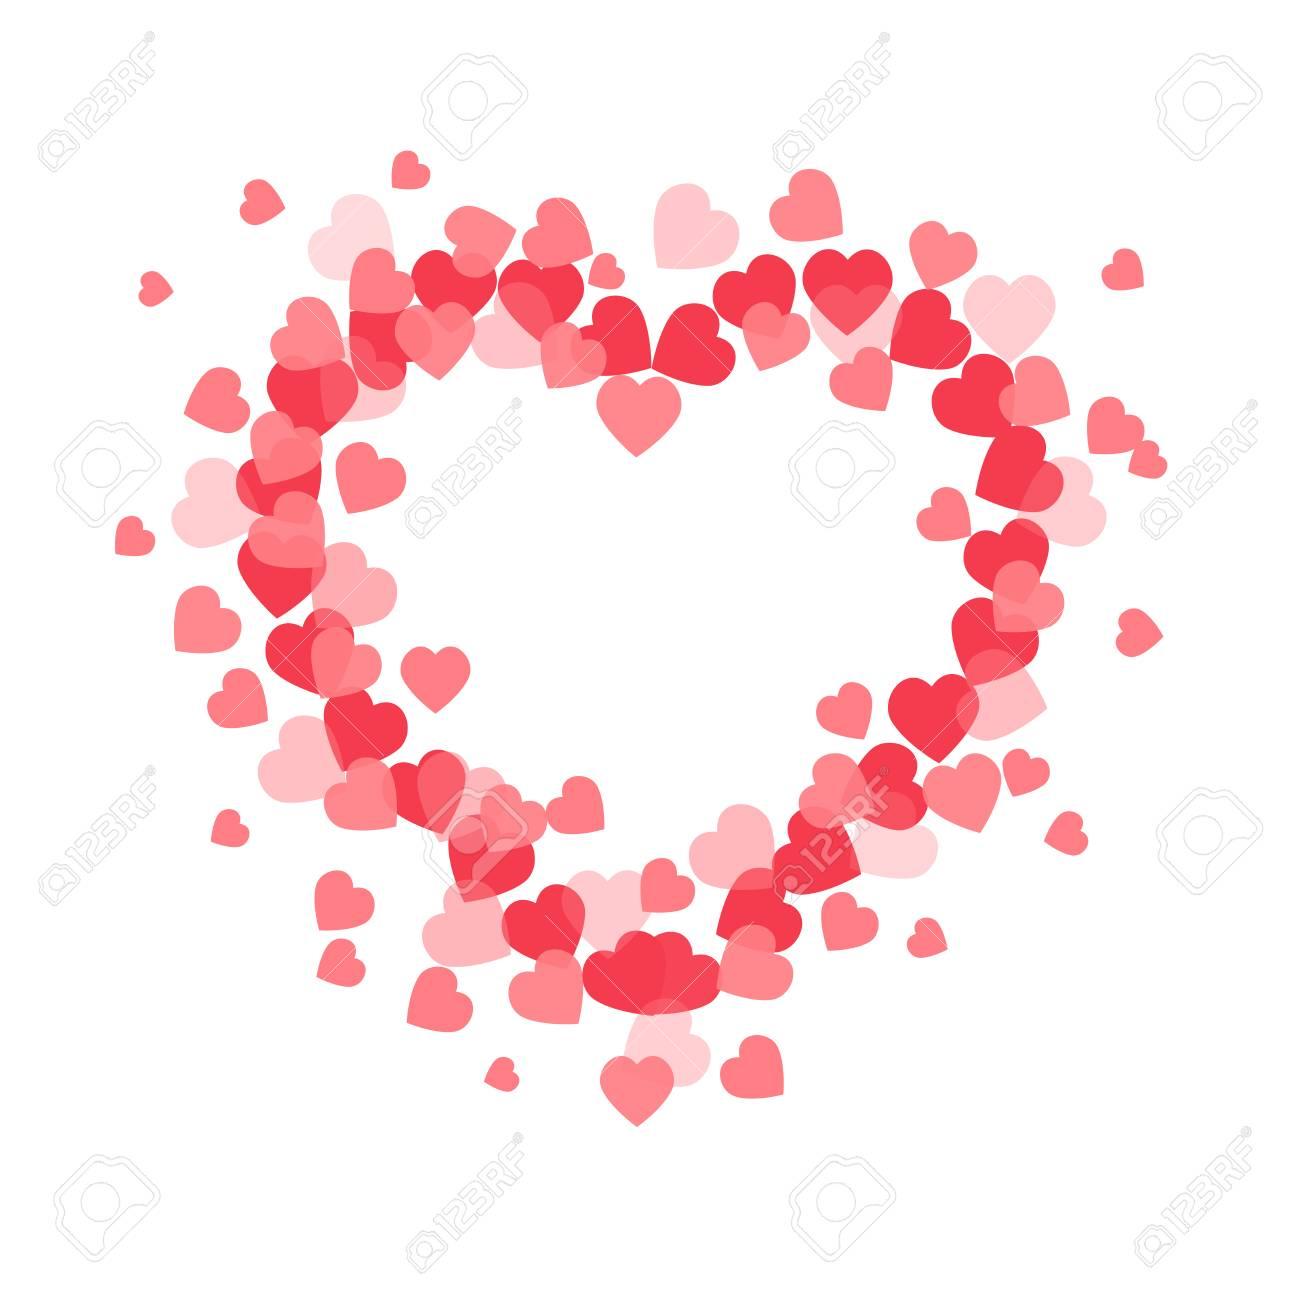 Corazón De Vector Abstracto. Elemento Para Marco. Ilustración ...